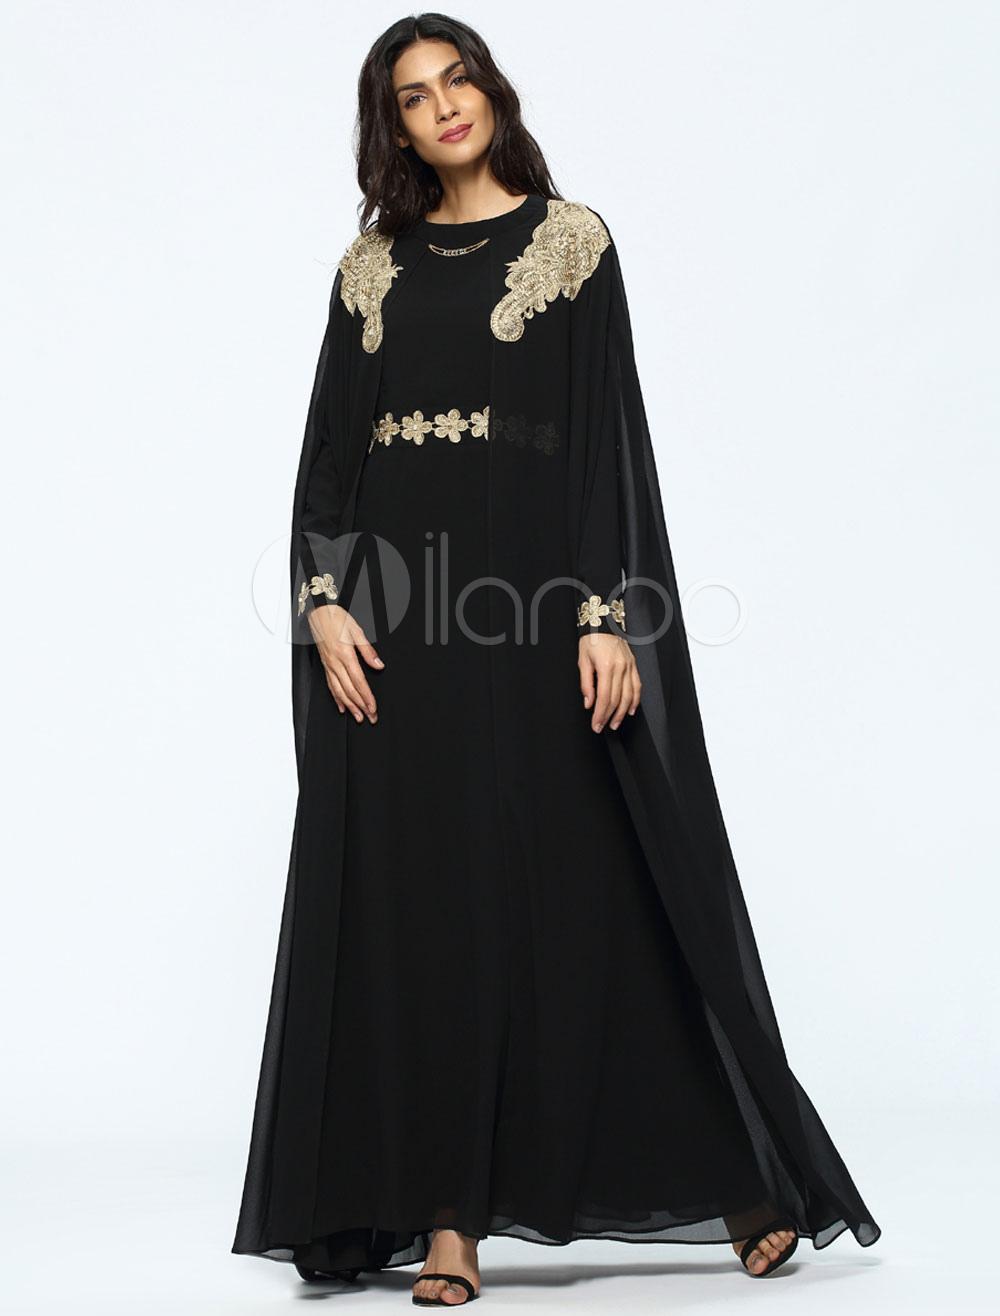 2cf2cc5c04 Black Abaya Dress Muslim Women Chiffon Oversized Long Sleeve Fake Two Piece  Maxi Cape Dress